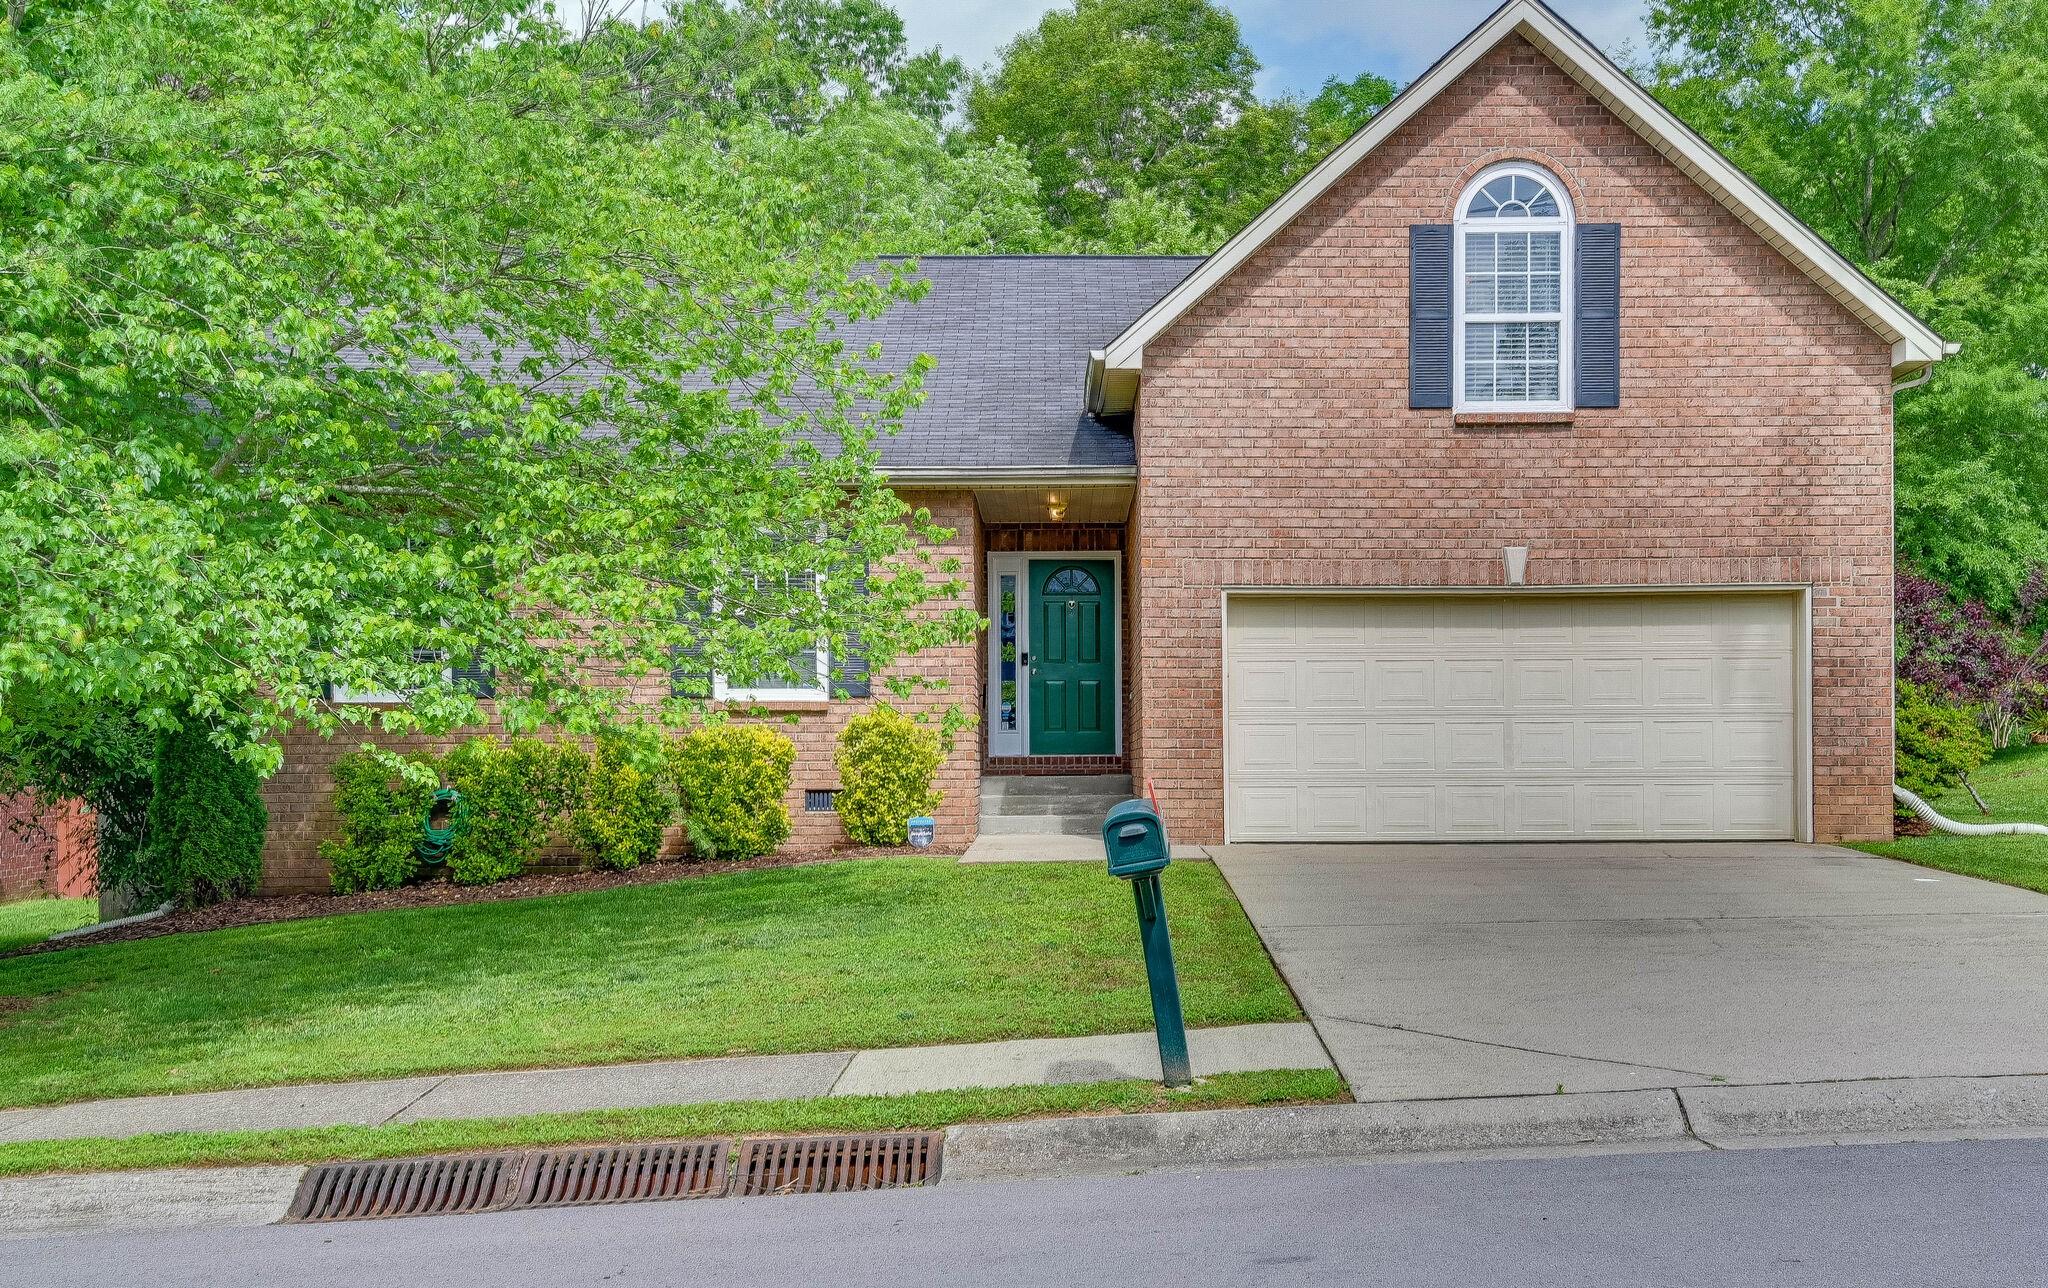 7116 Somerset Farms Dr Property Photo - Nashville, TN real estate listing